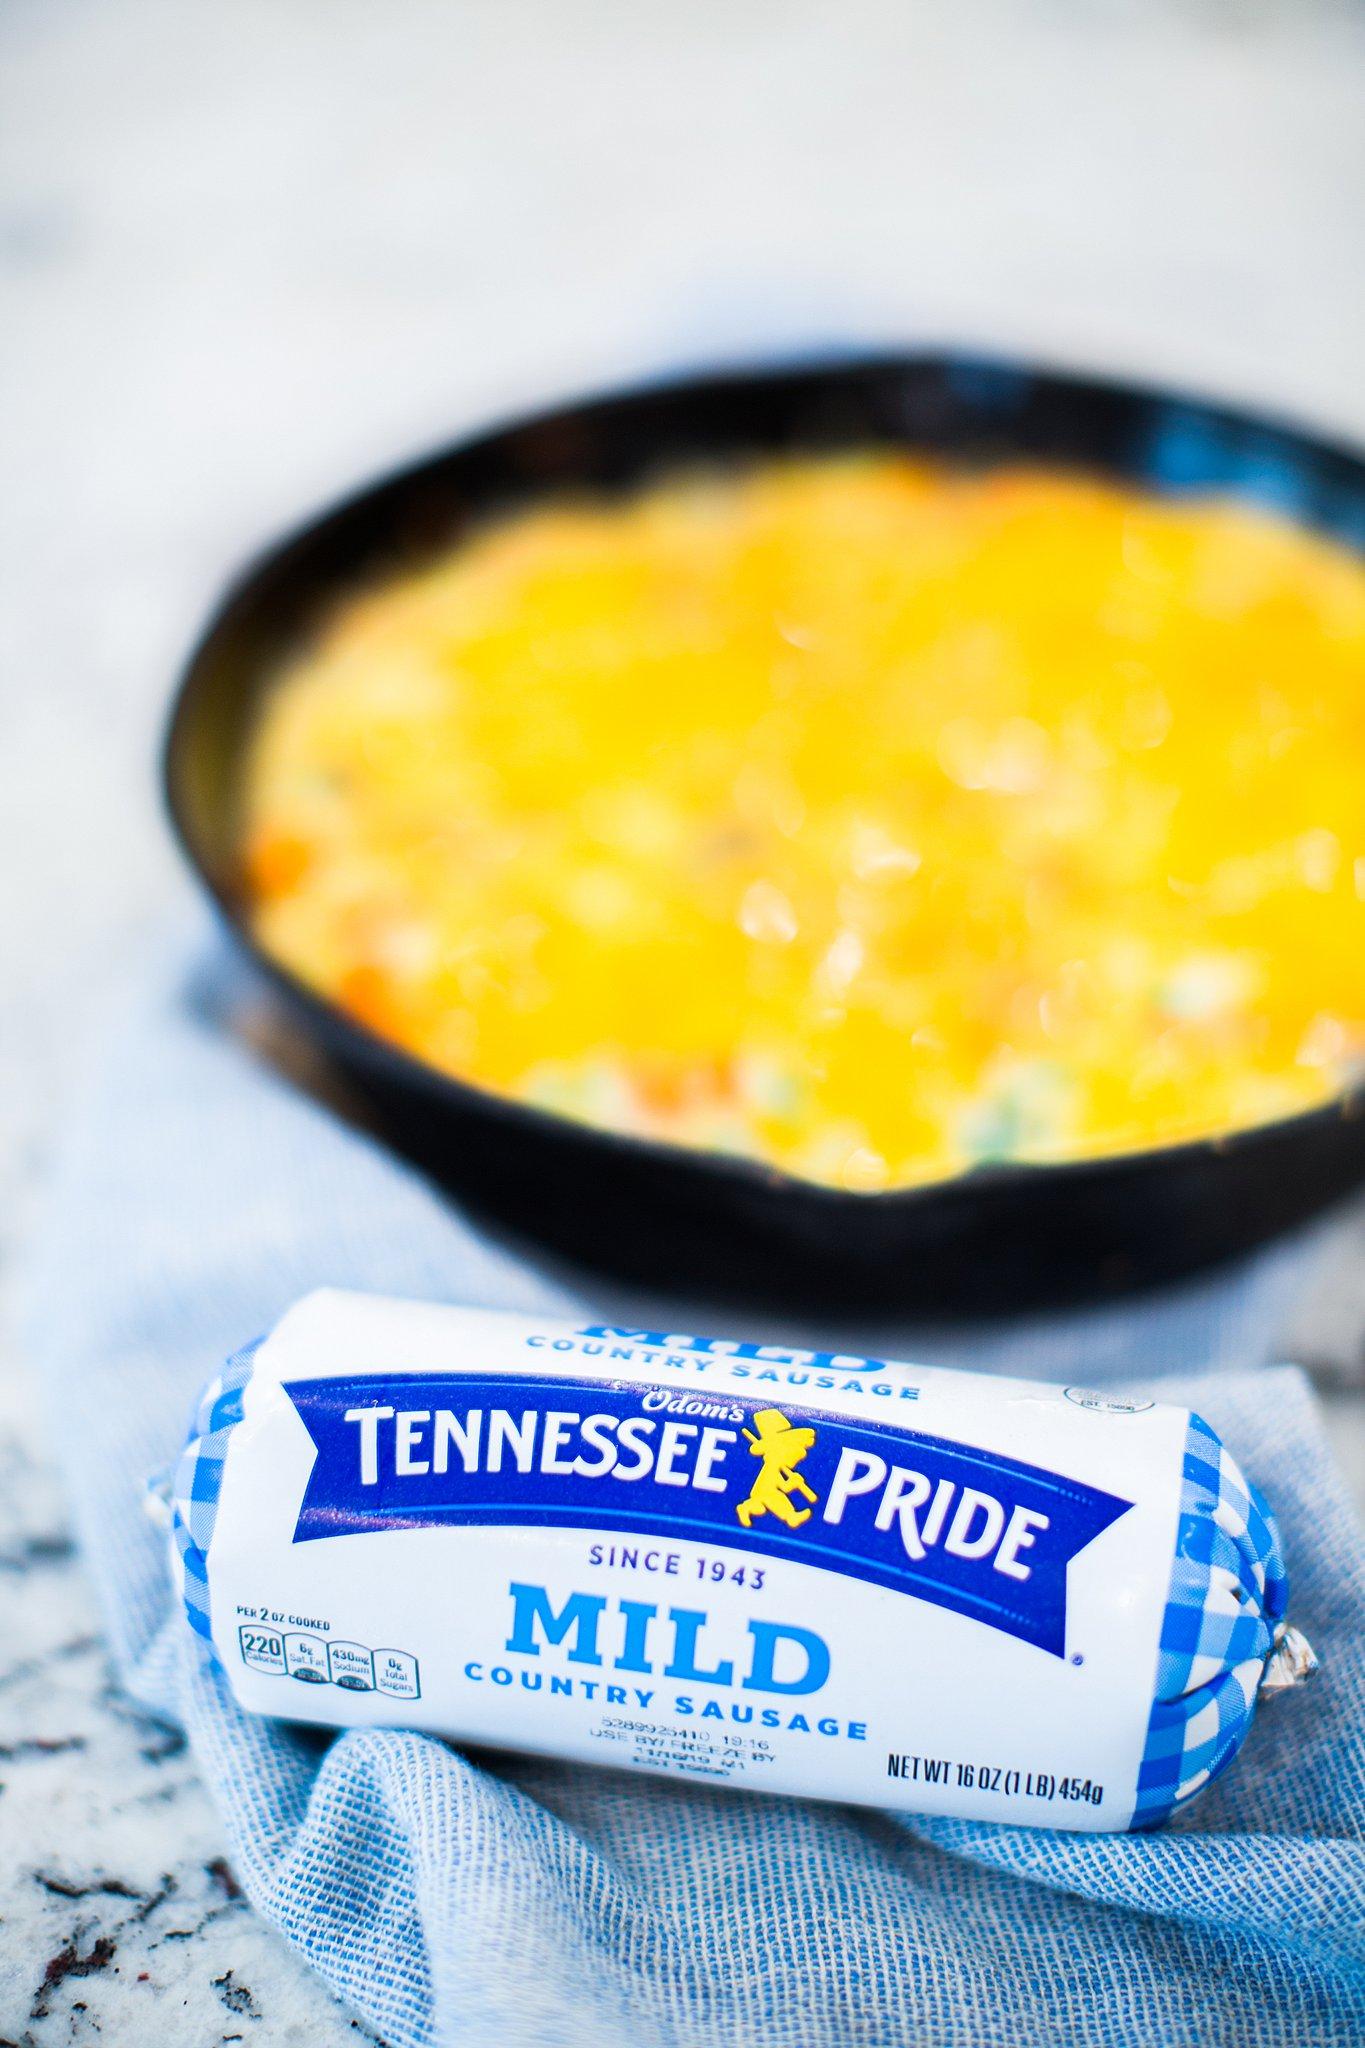 odoms Tennessee pride sausage